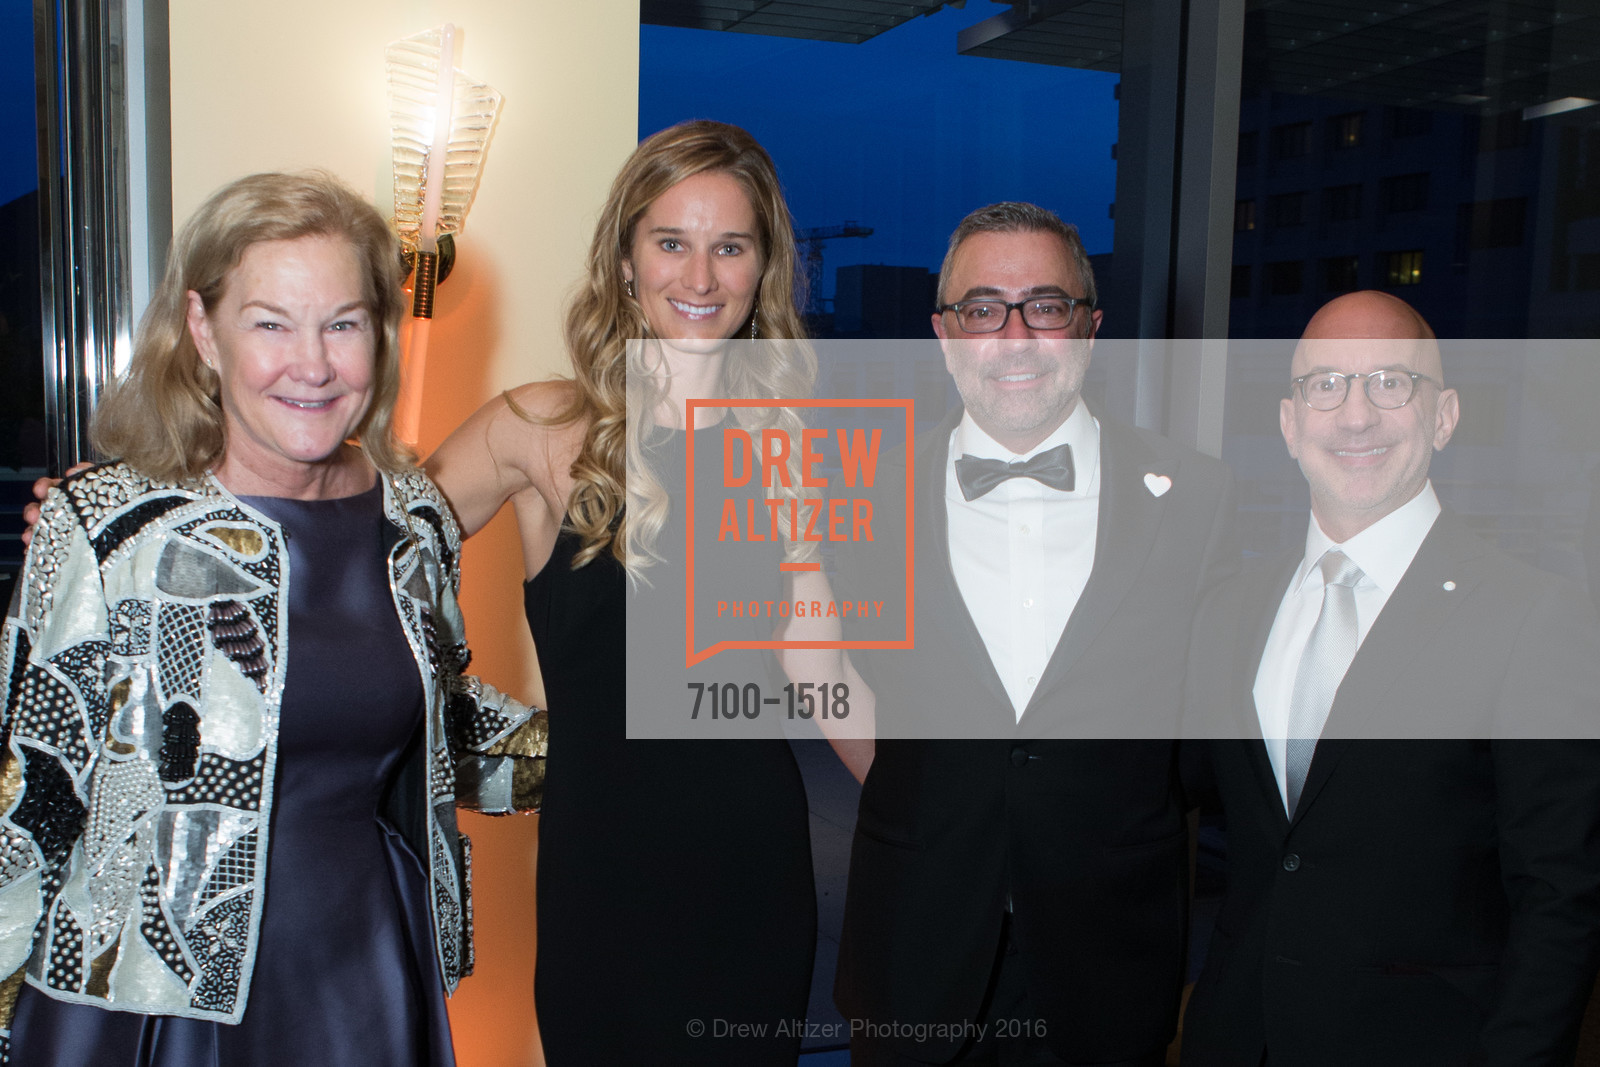 Meredith Taylor, Jeff Wisenant, Jim Torretti, Photo #7100-1518